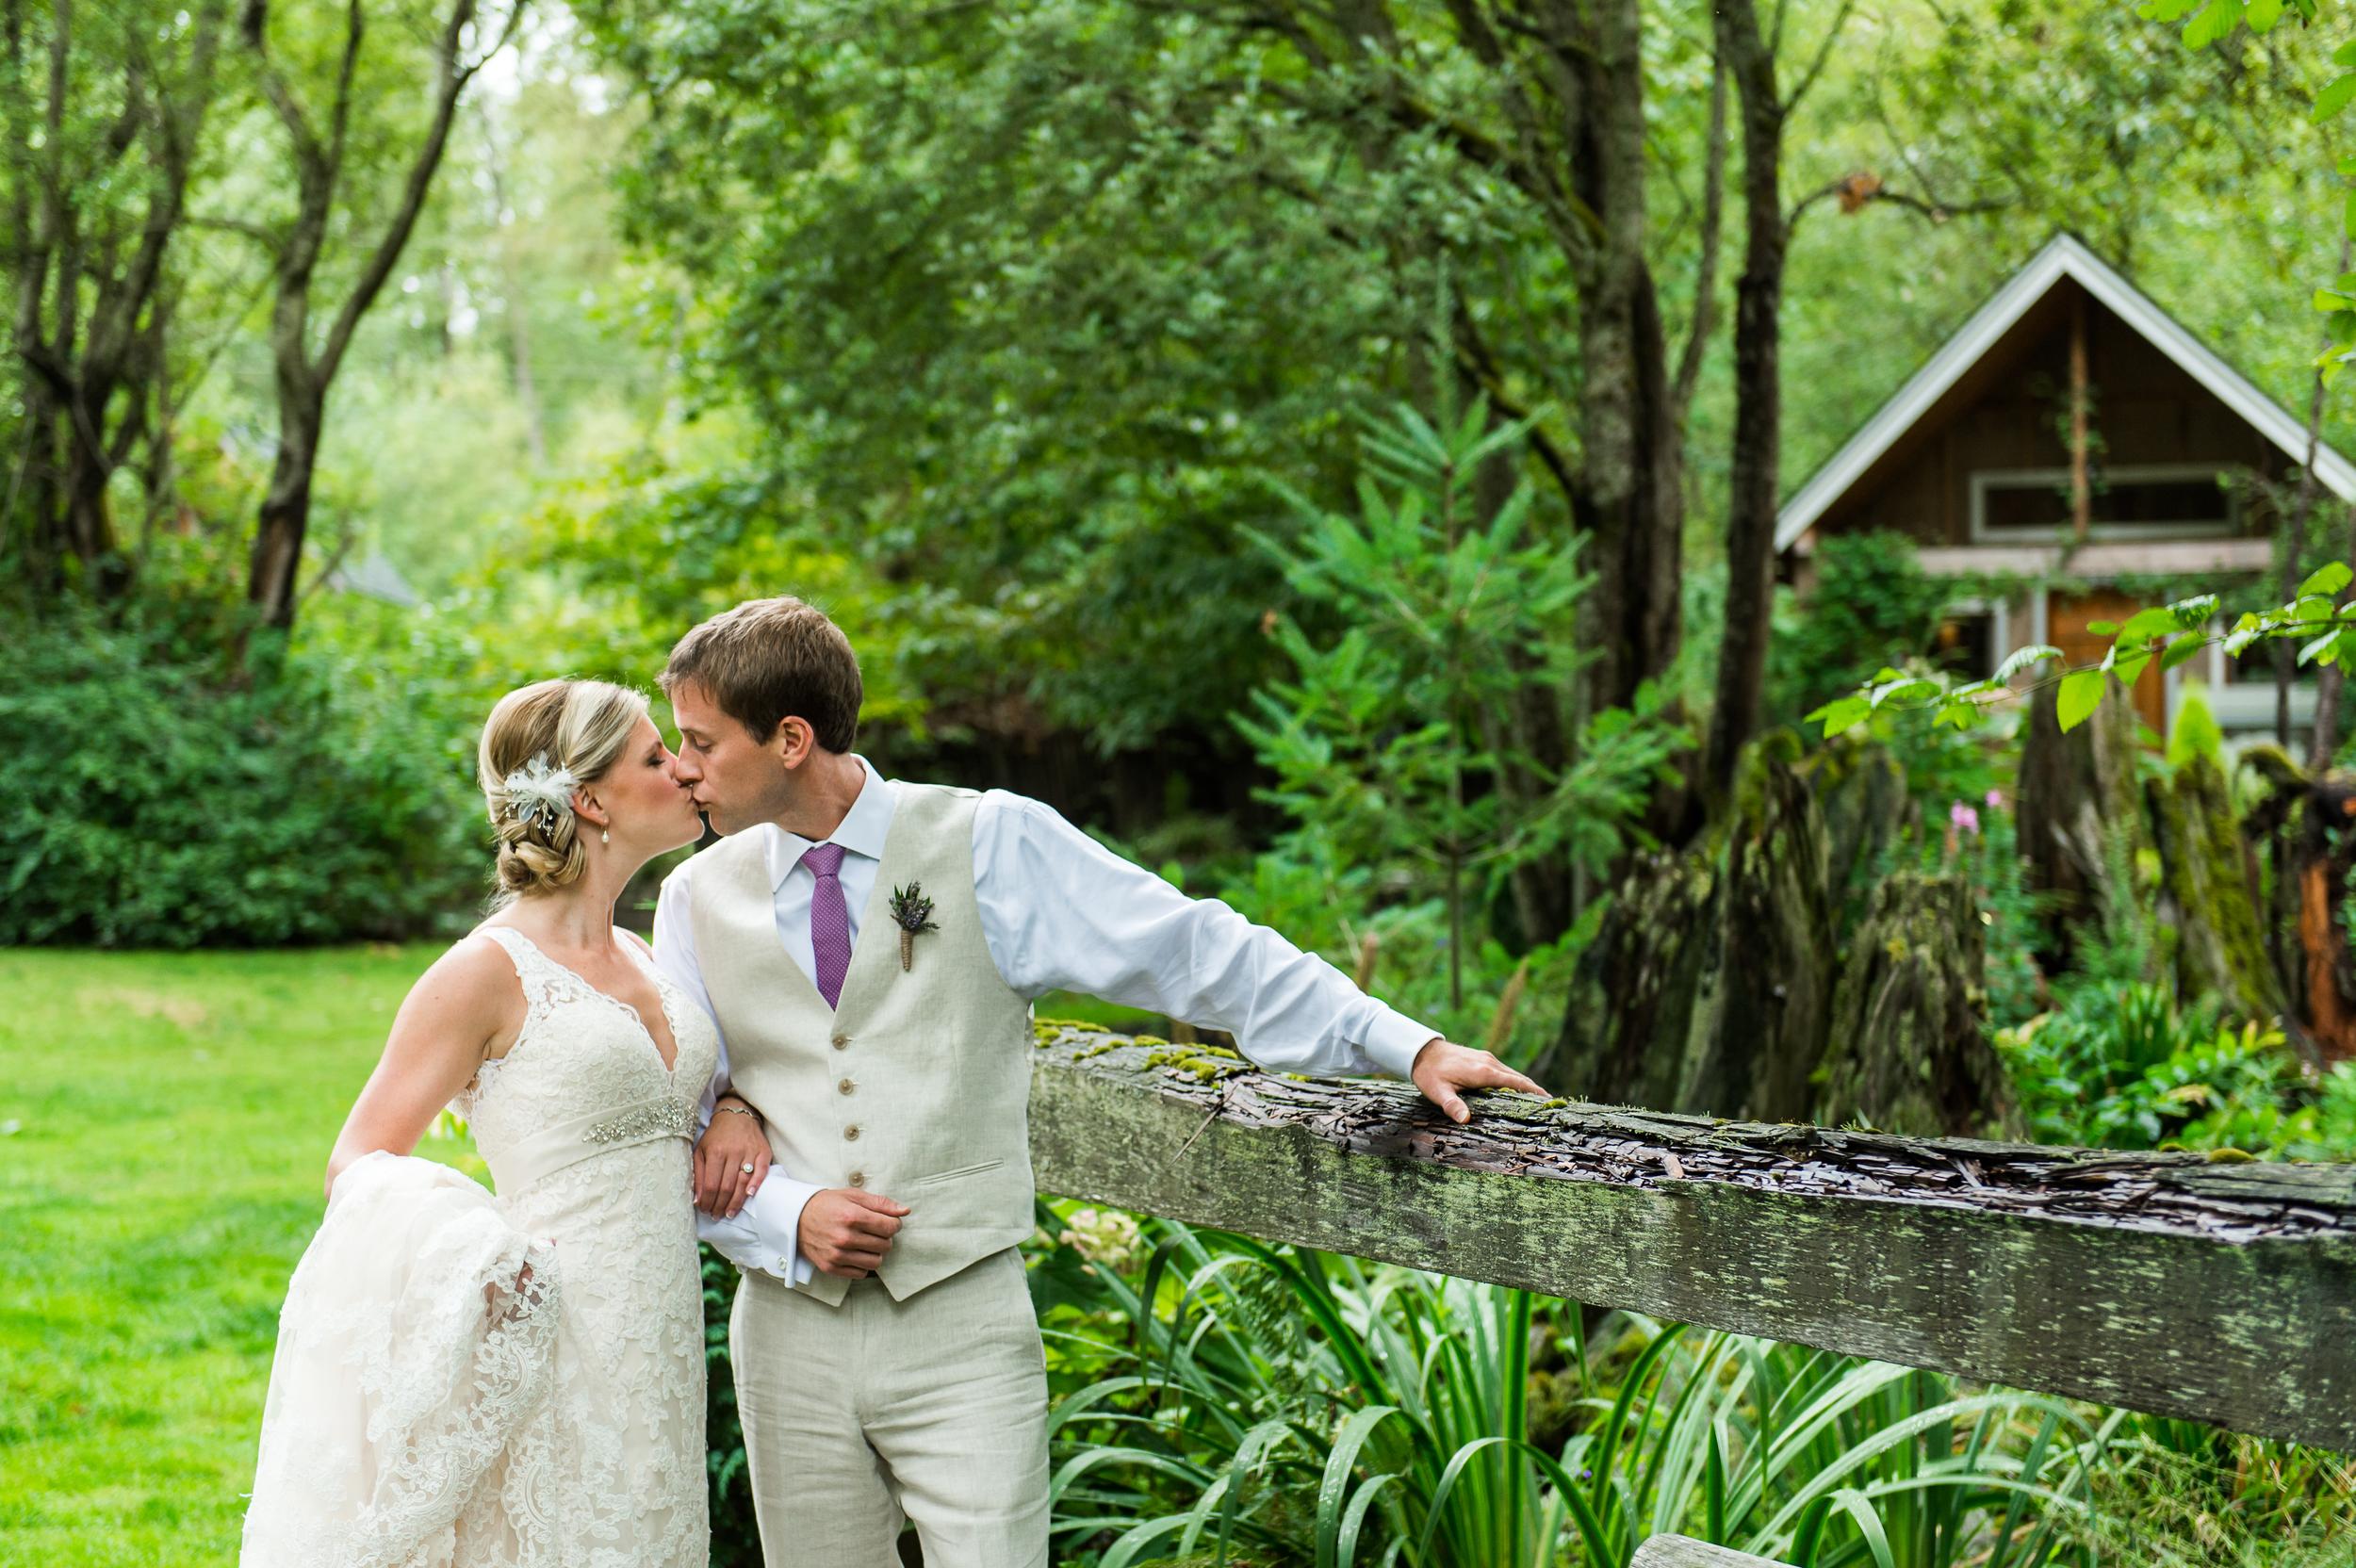 JJ-wedding-Van-Wyhe-Photography-193.jpg